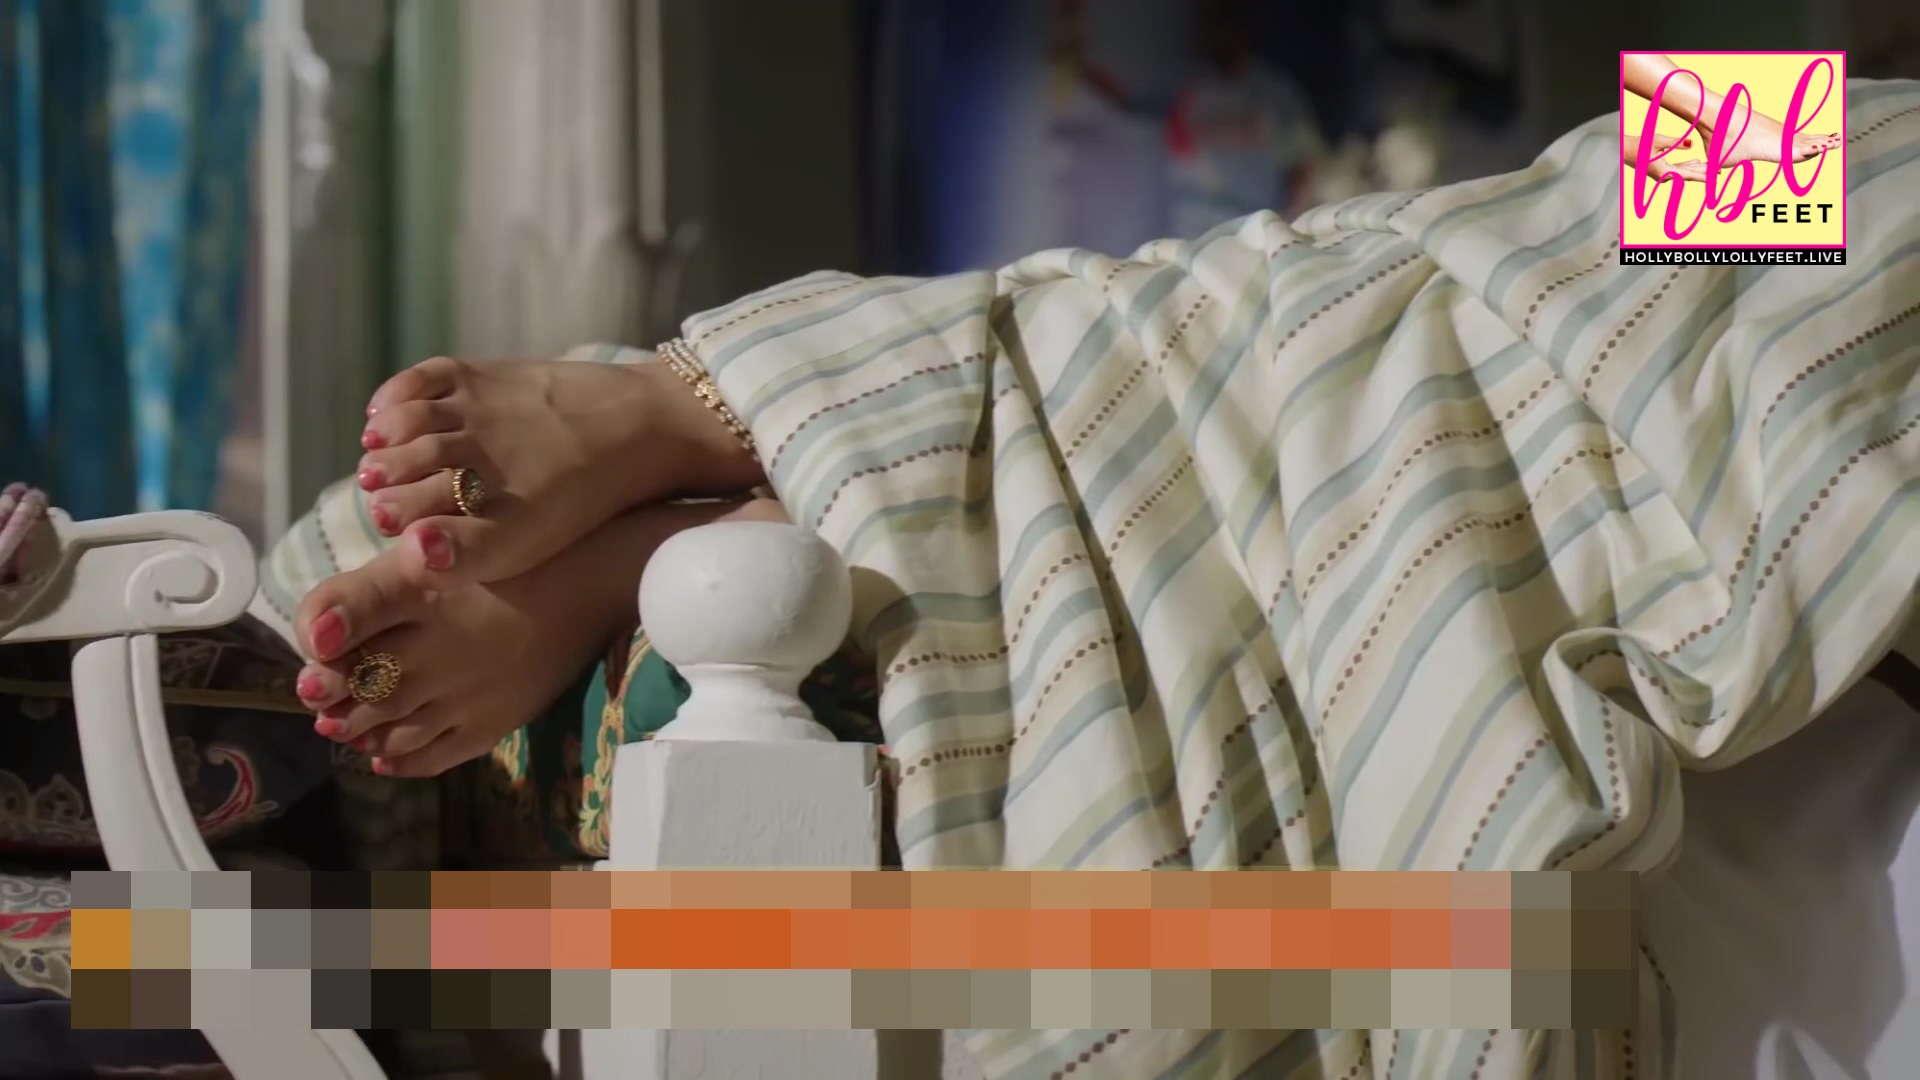 Tejaswi Prakash Wayangankar Feet Closeup